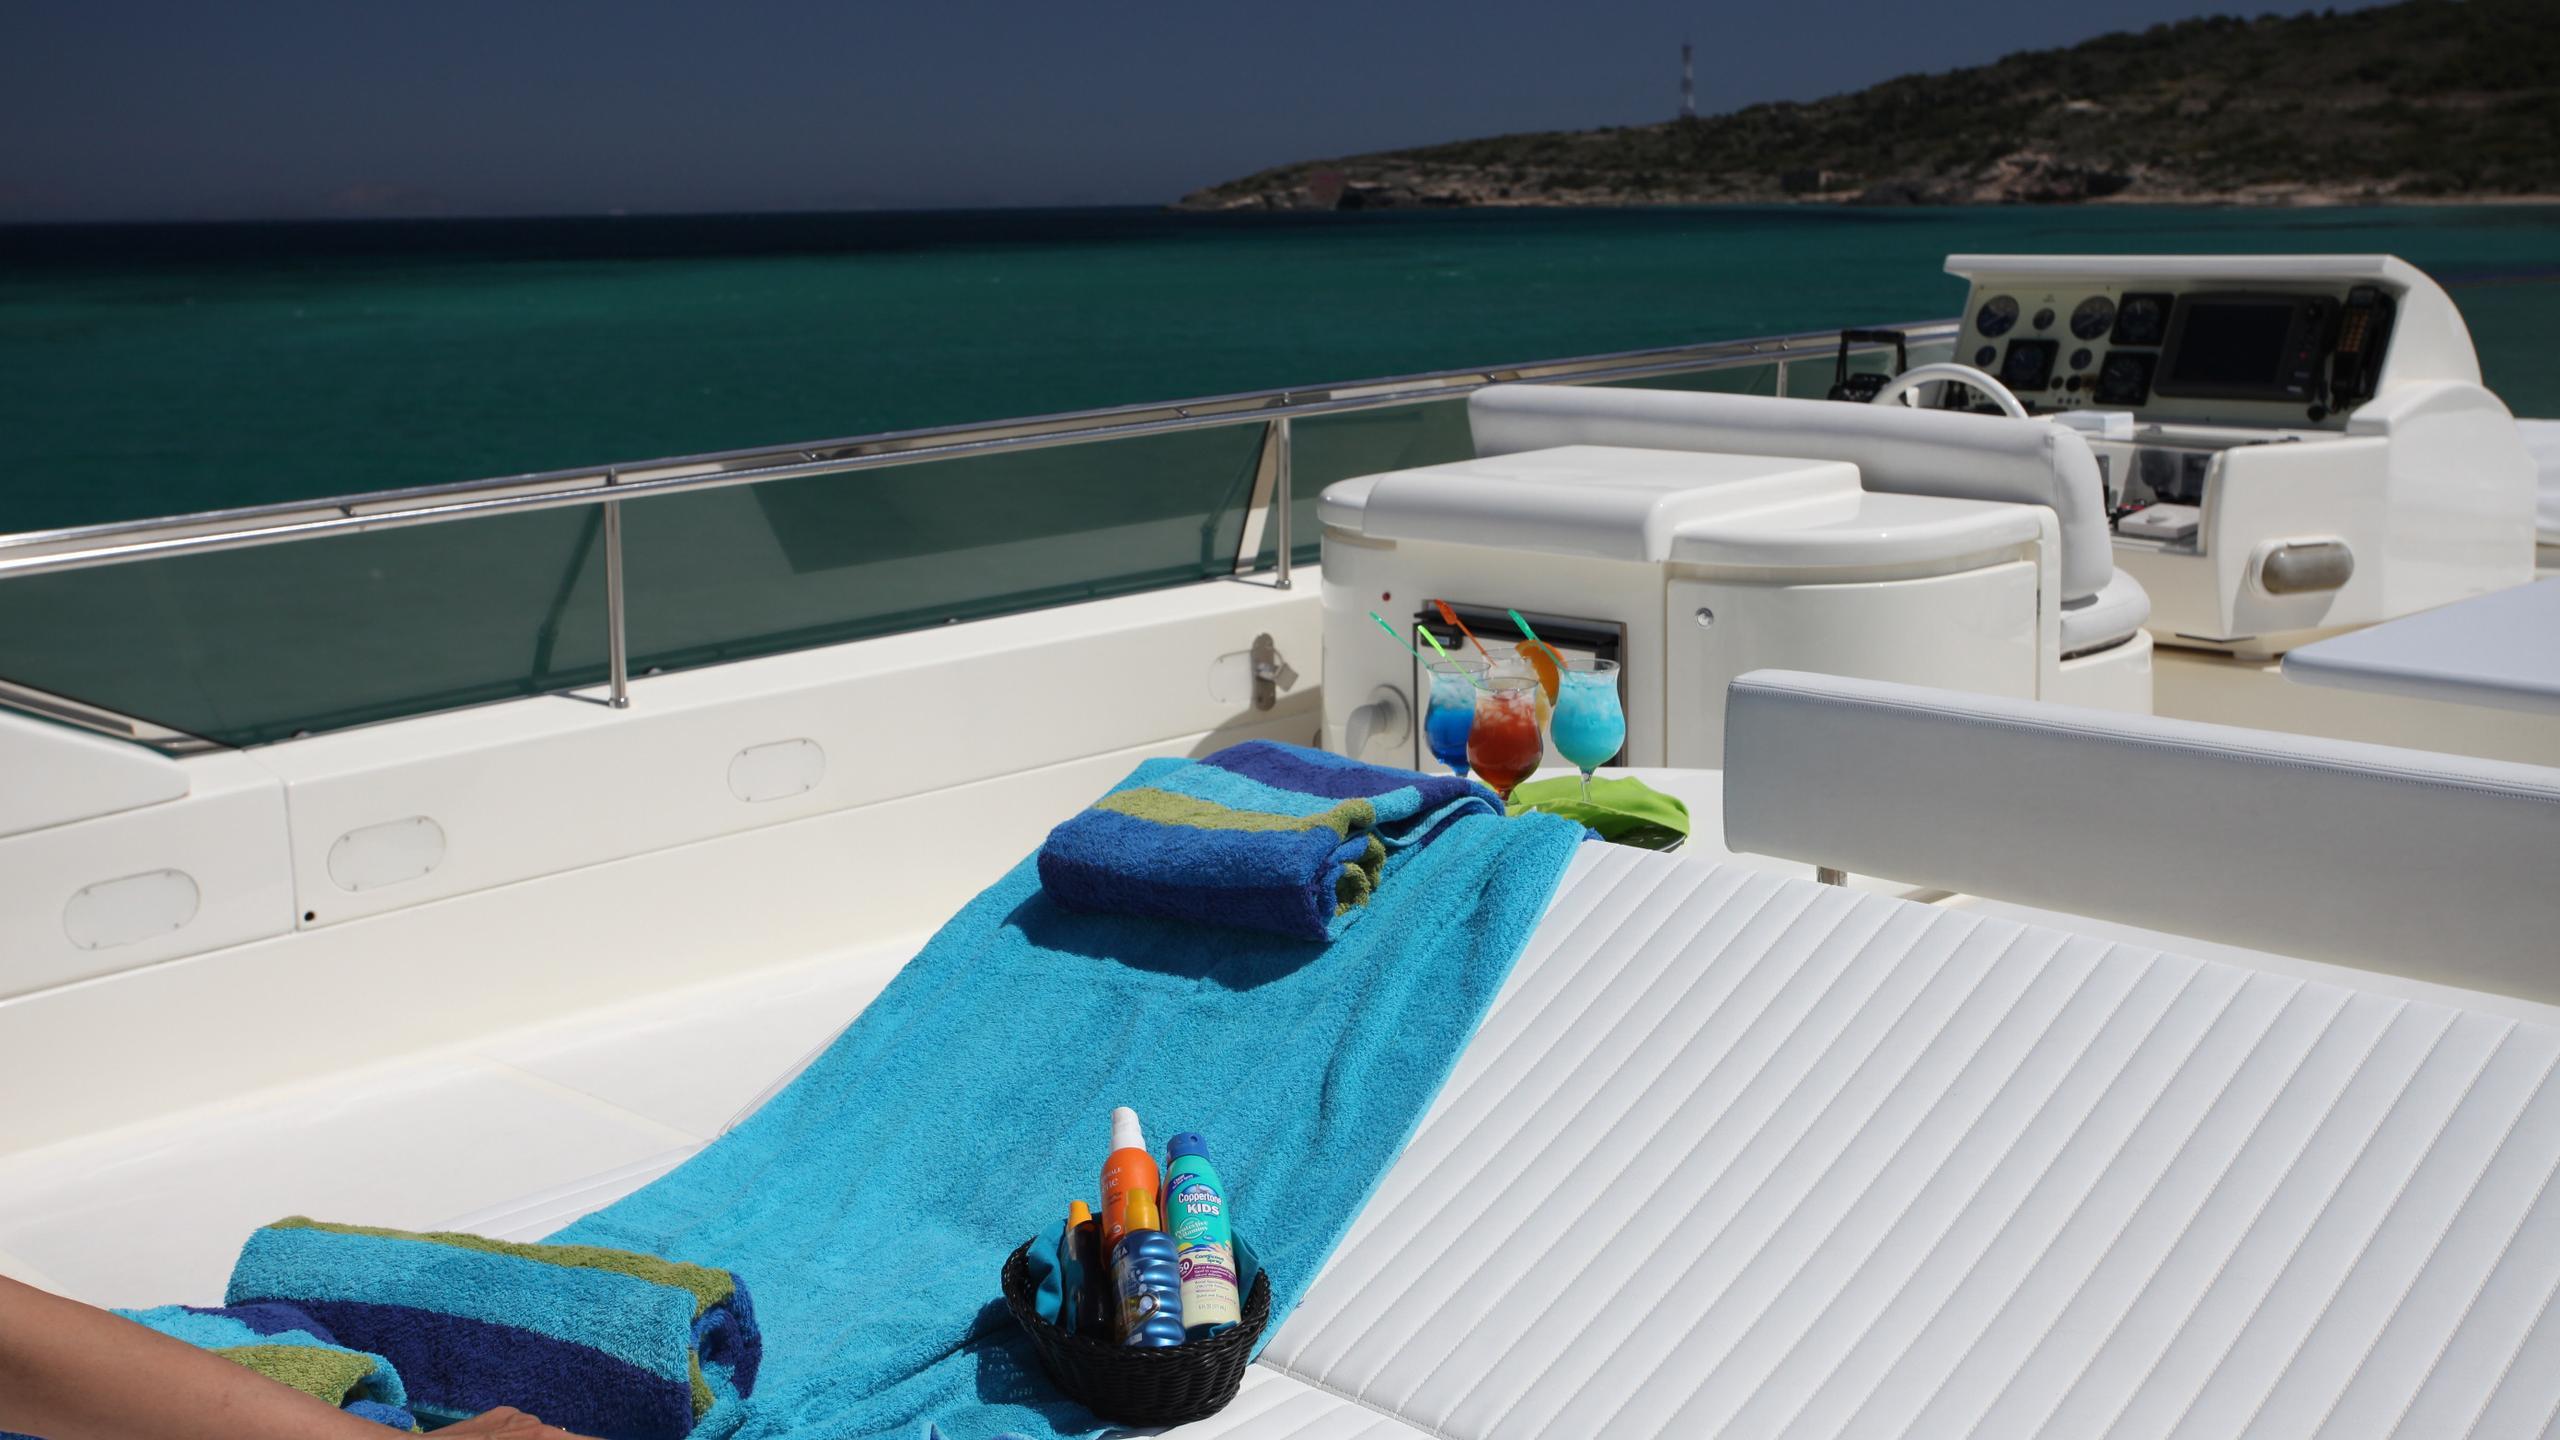 kentavros-ii-yacht-fly-deck